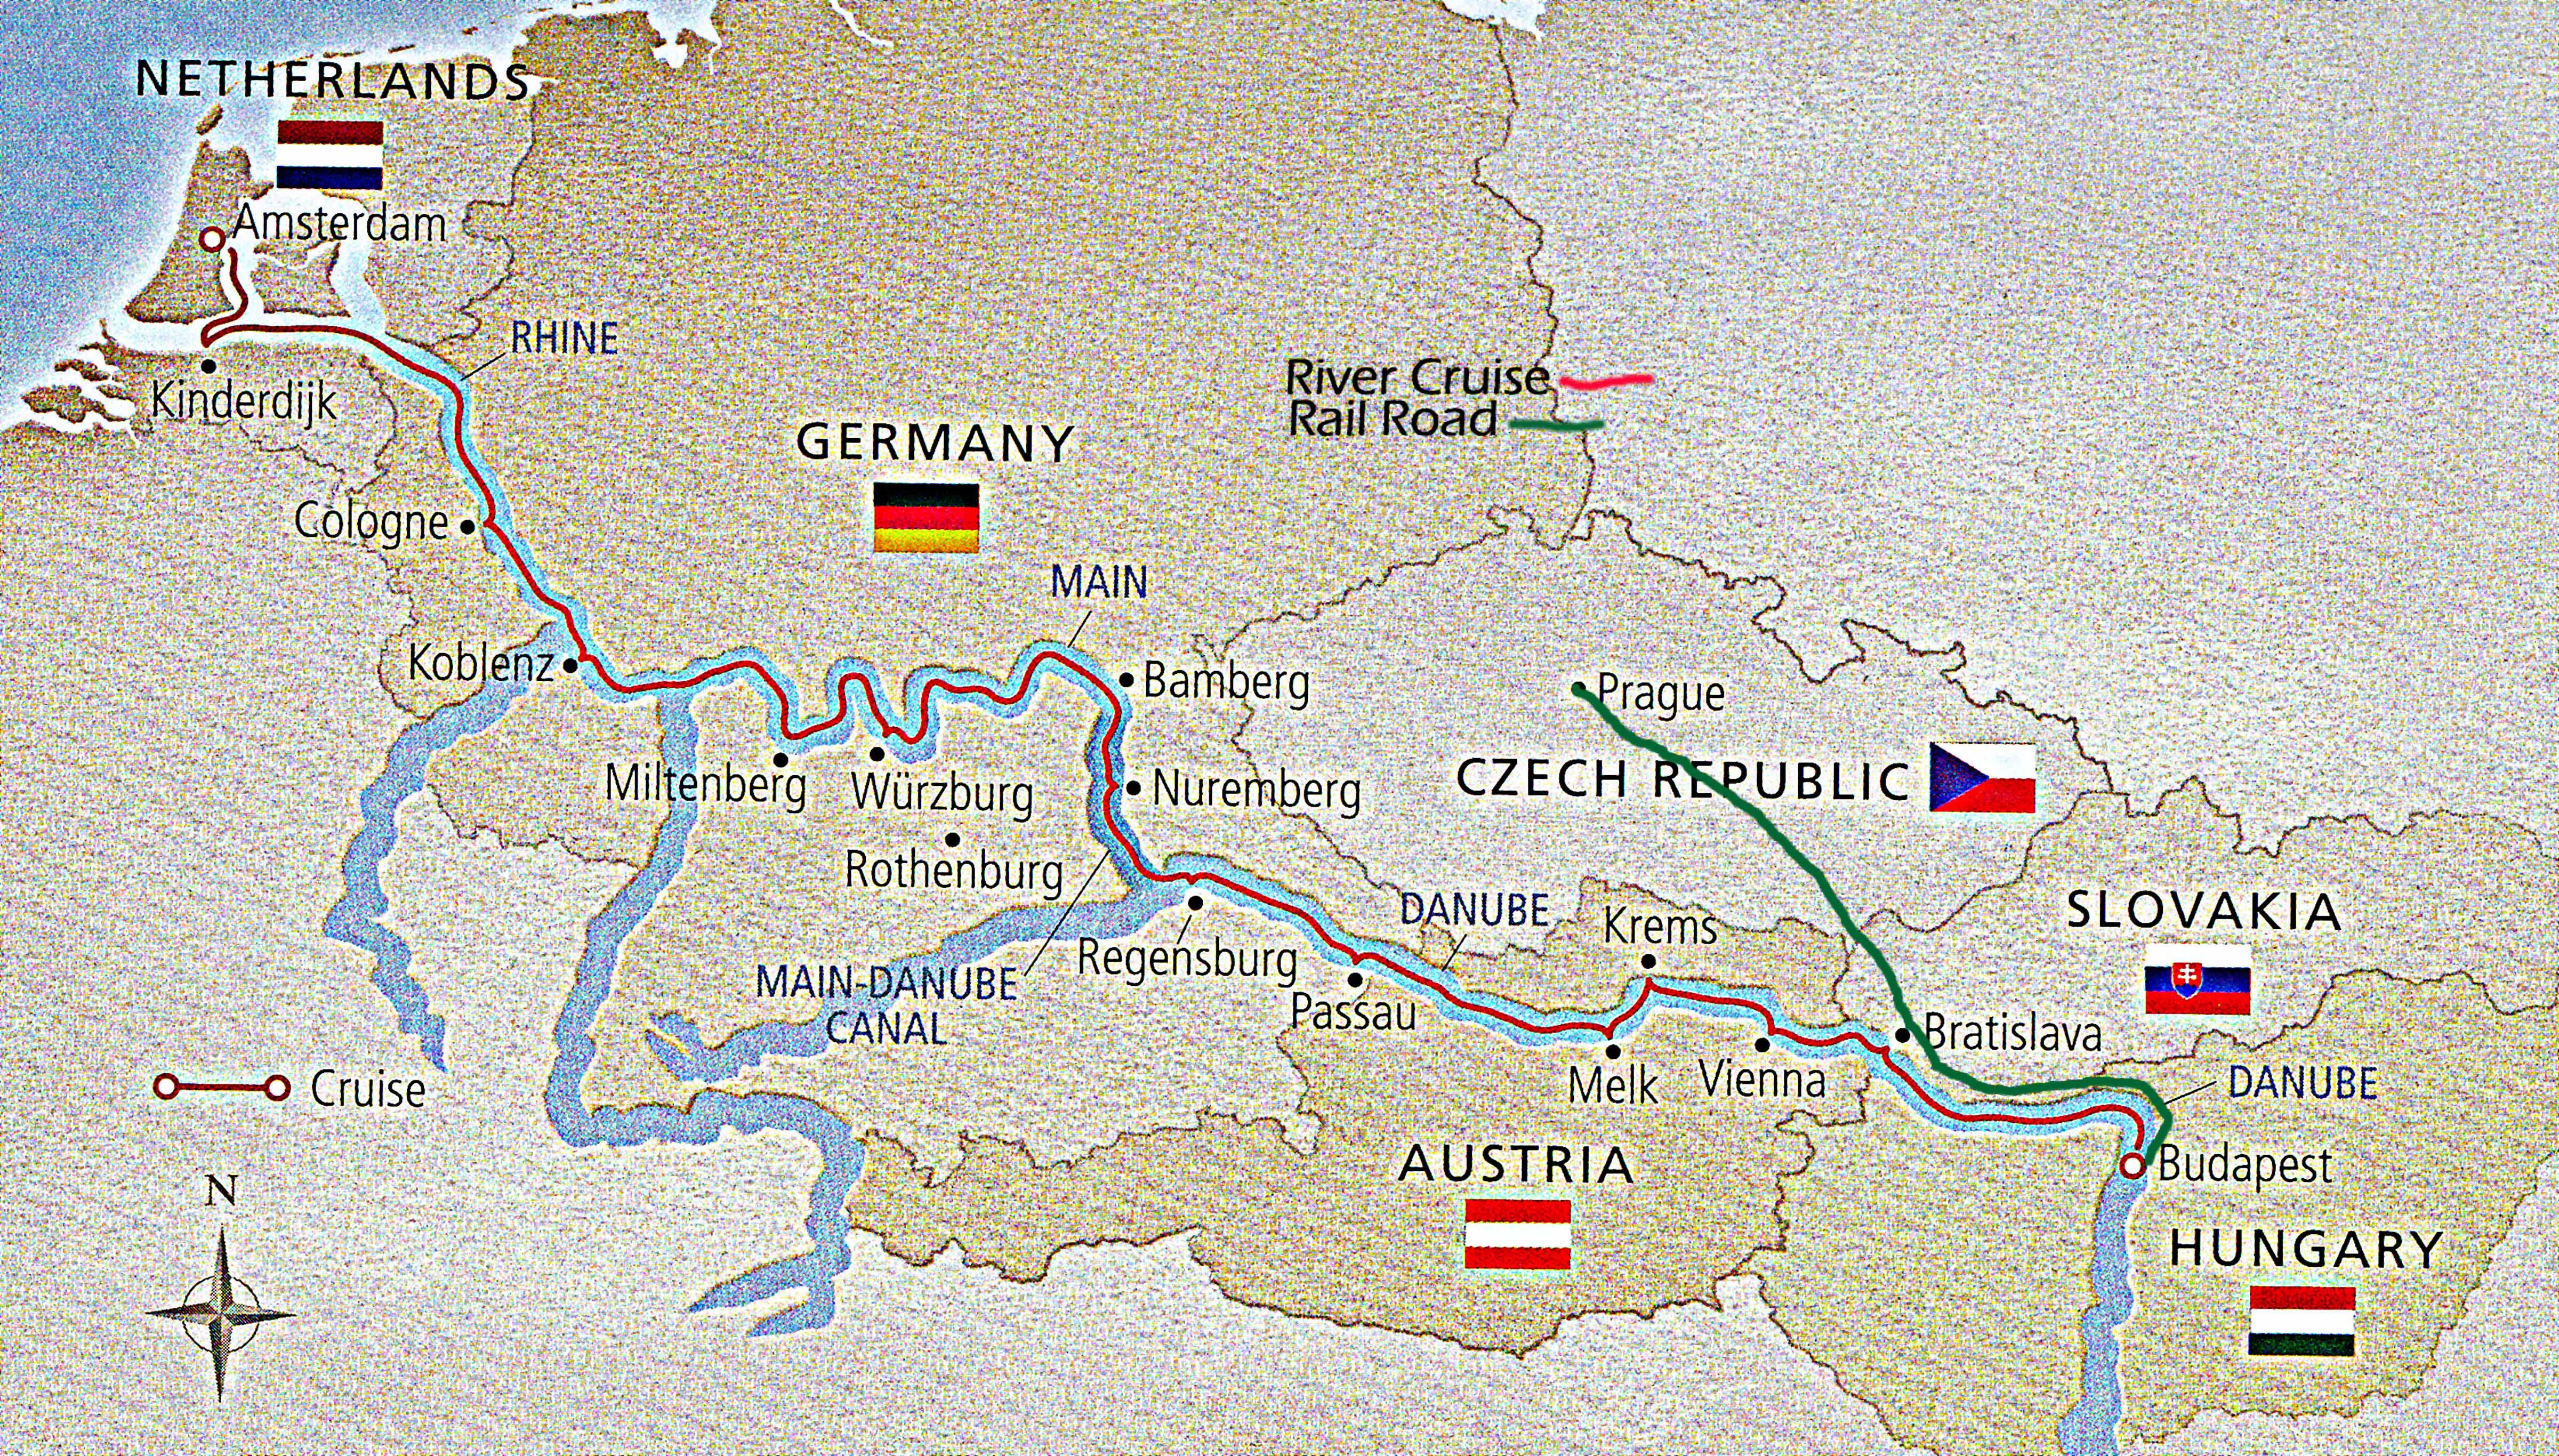 Europe2014/map-1.jpg